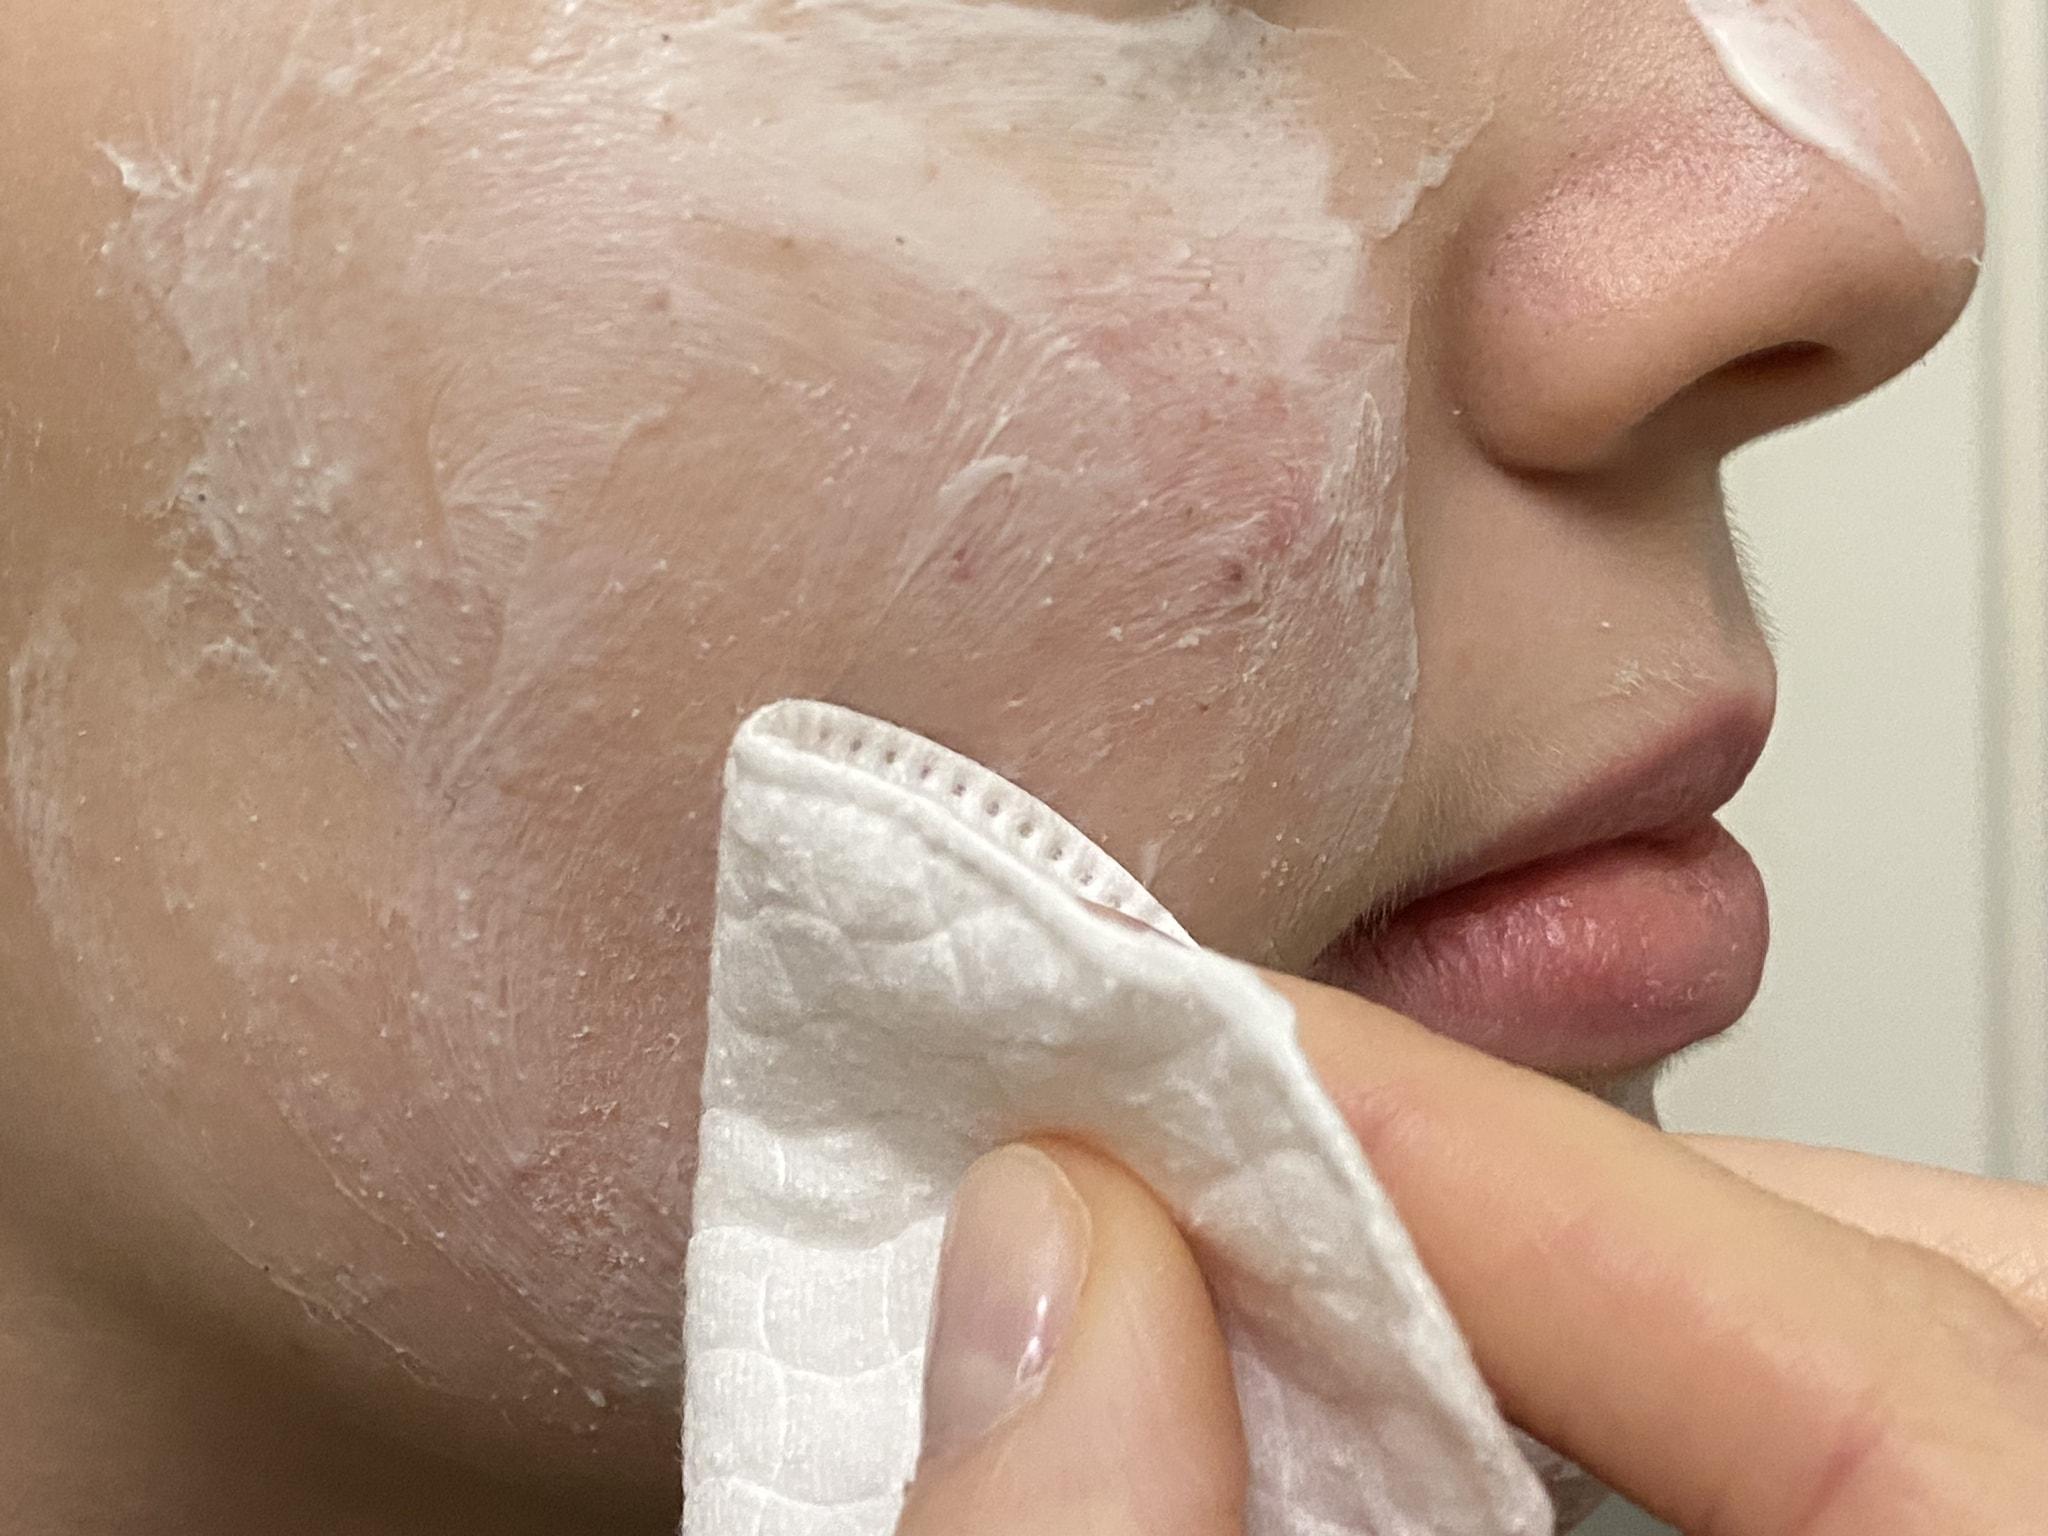 maschera viso come applicarla